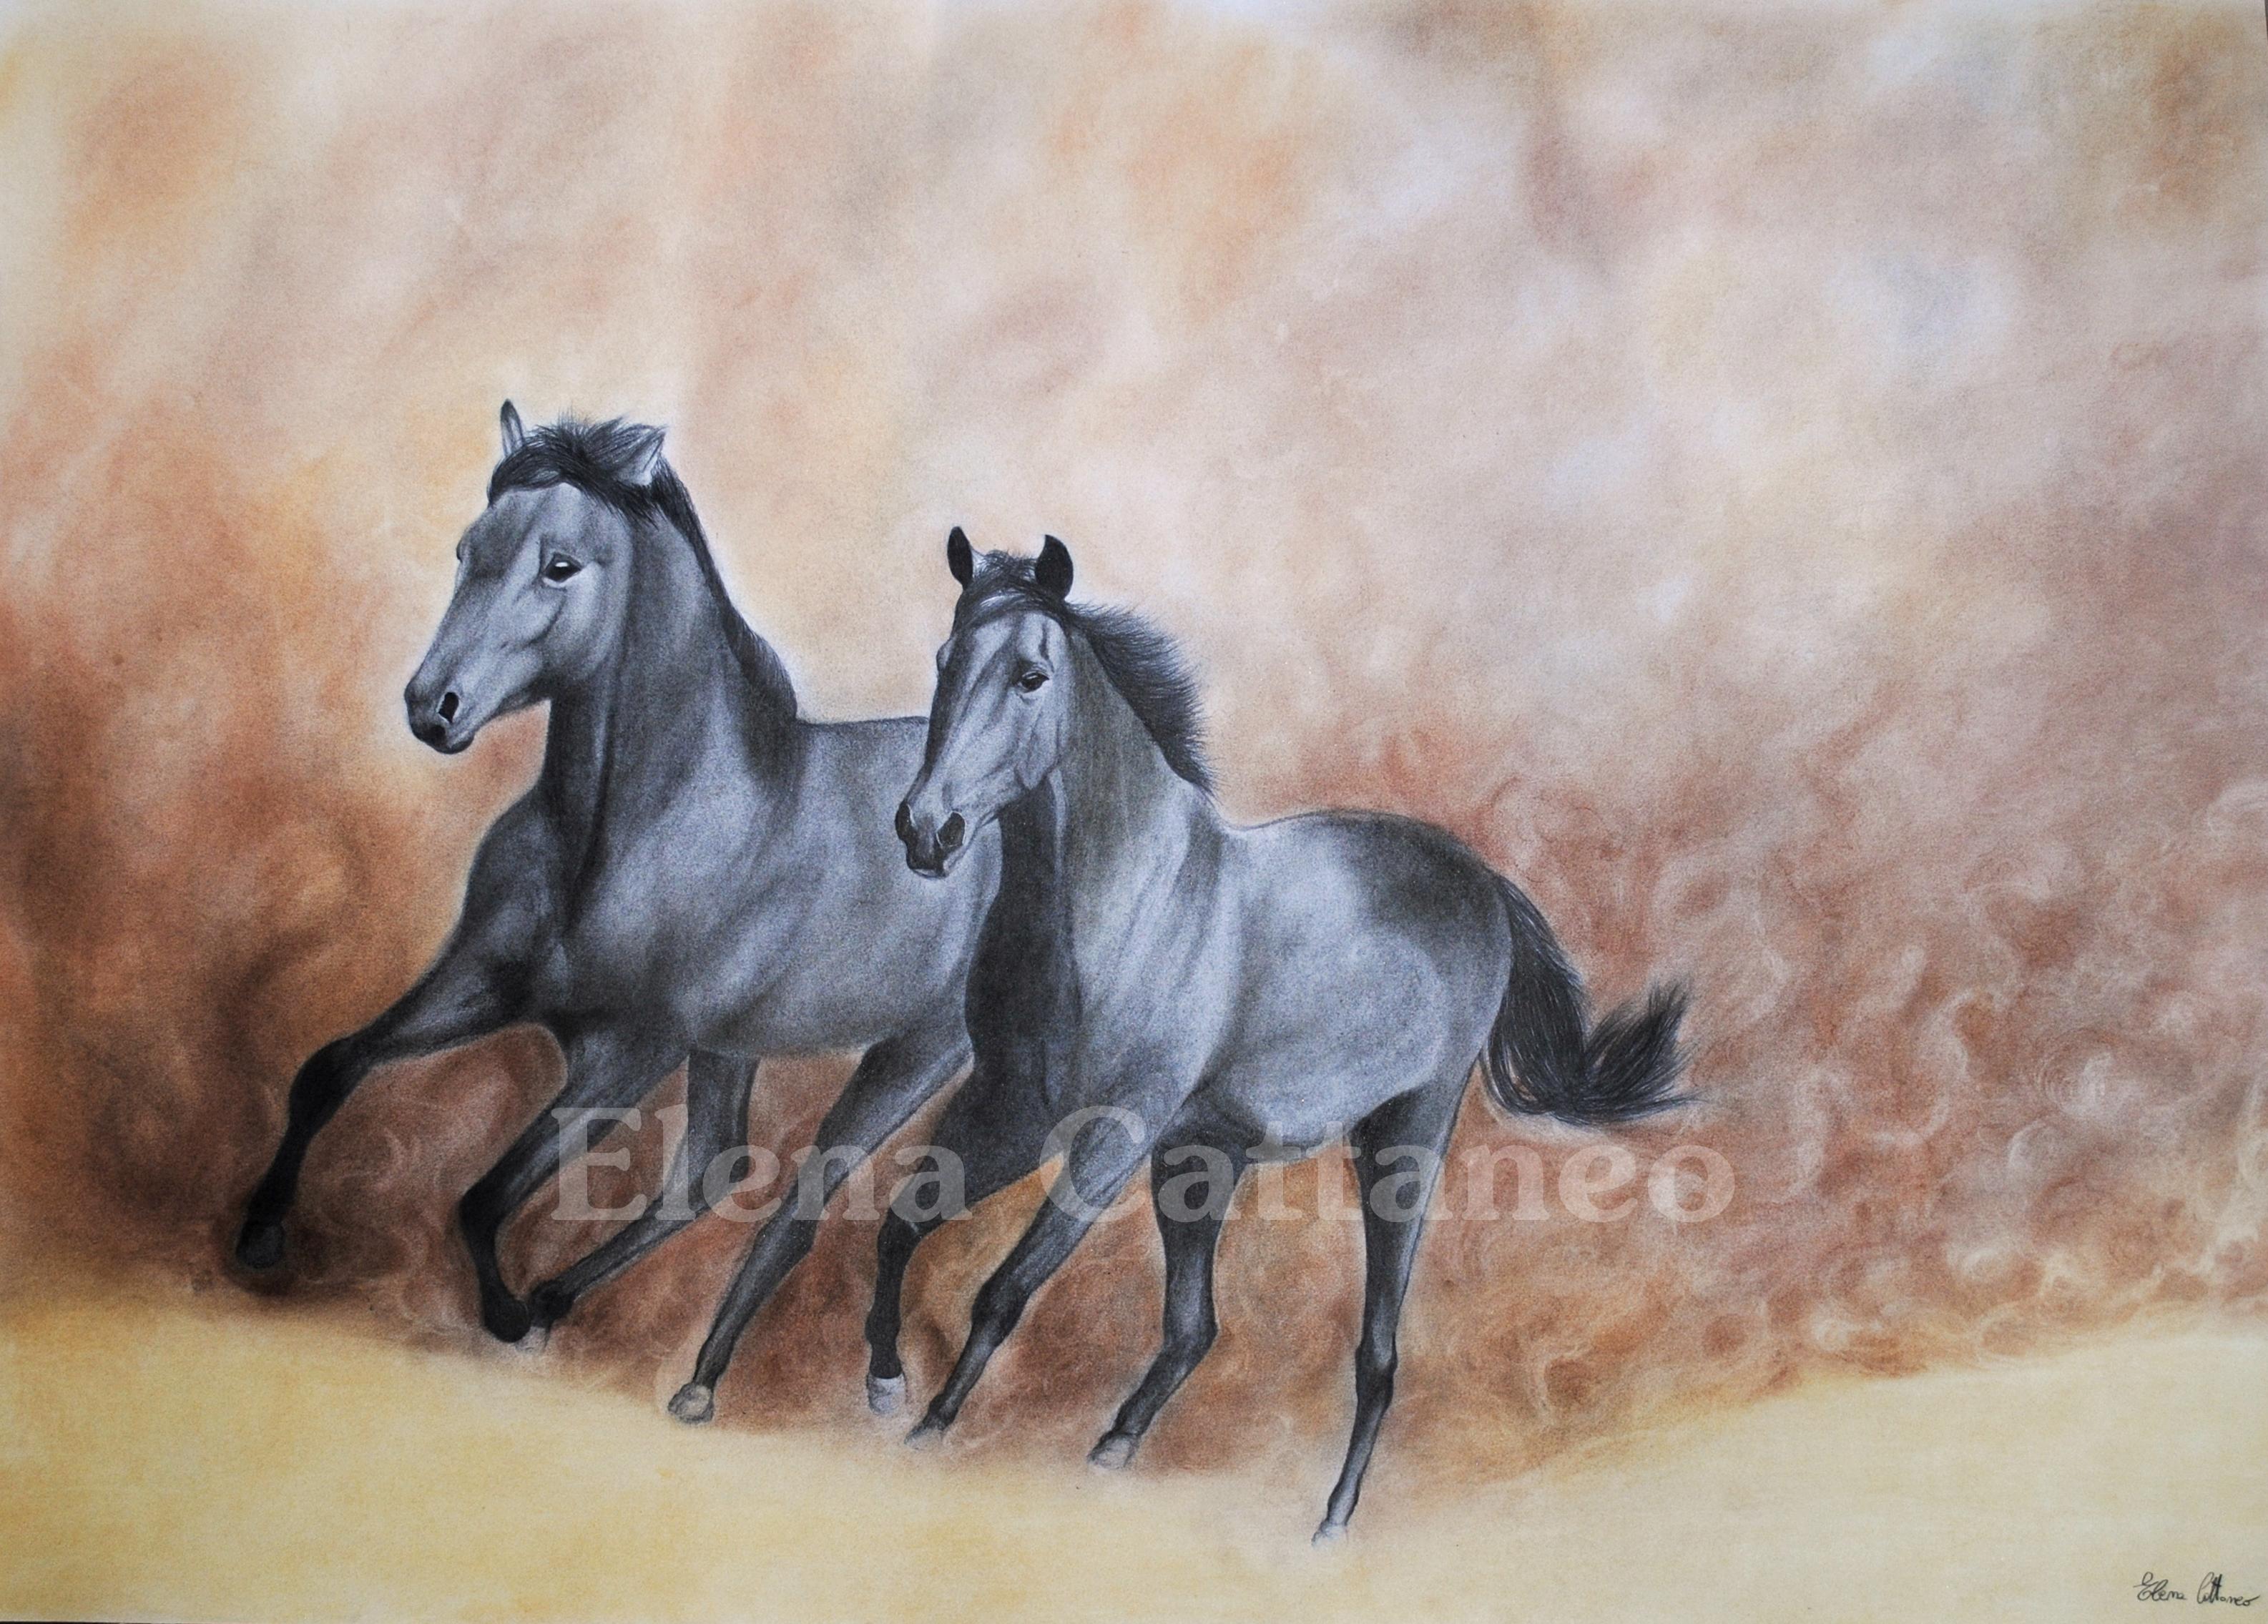 Disegni a matita di cavalli pictures to pin on pinterest for Disegni di cavalli a matita